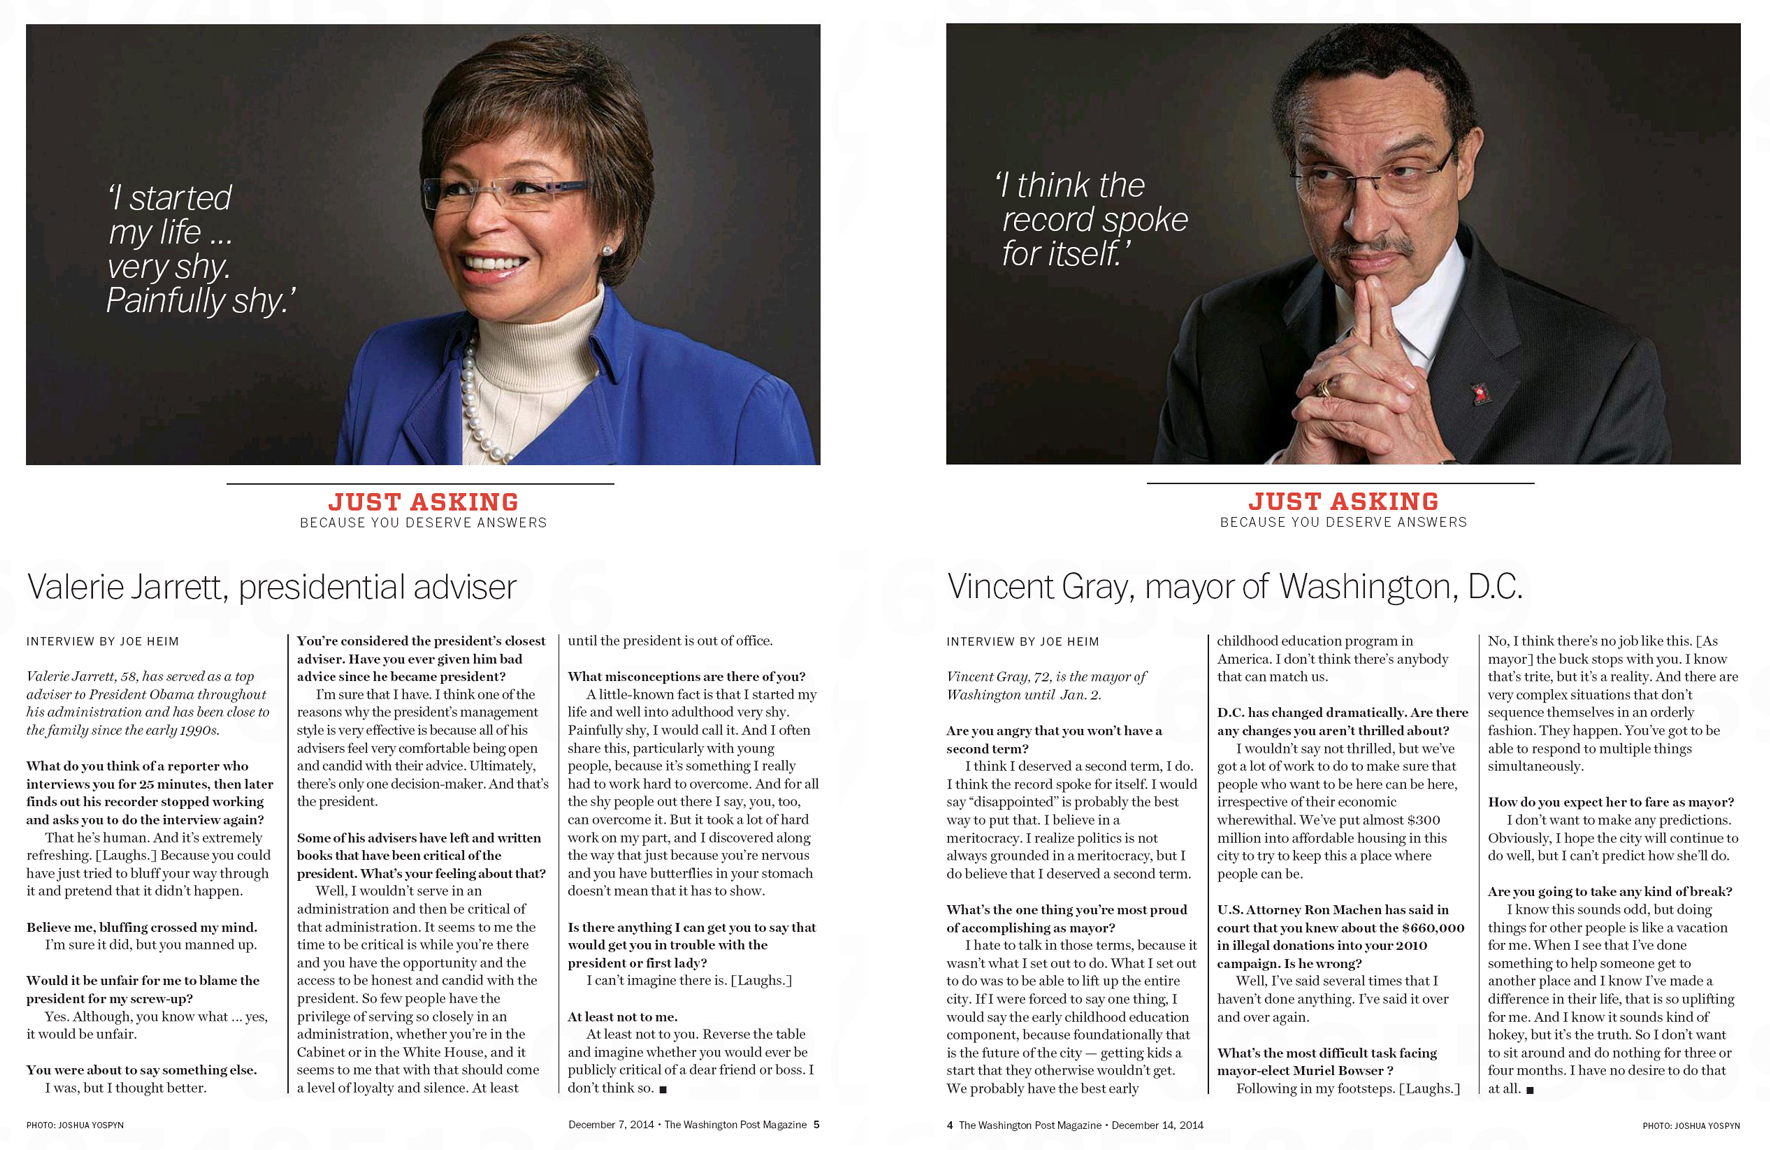 Portraits of Valerie Jarrett, adviser to President Obama, and former D.C. Mayor Vincent Gray for The Washington Post Magazine